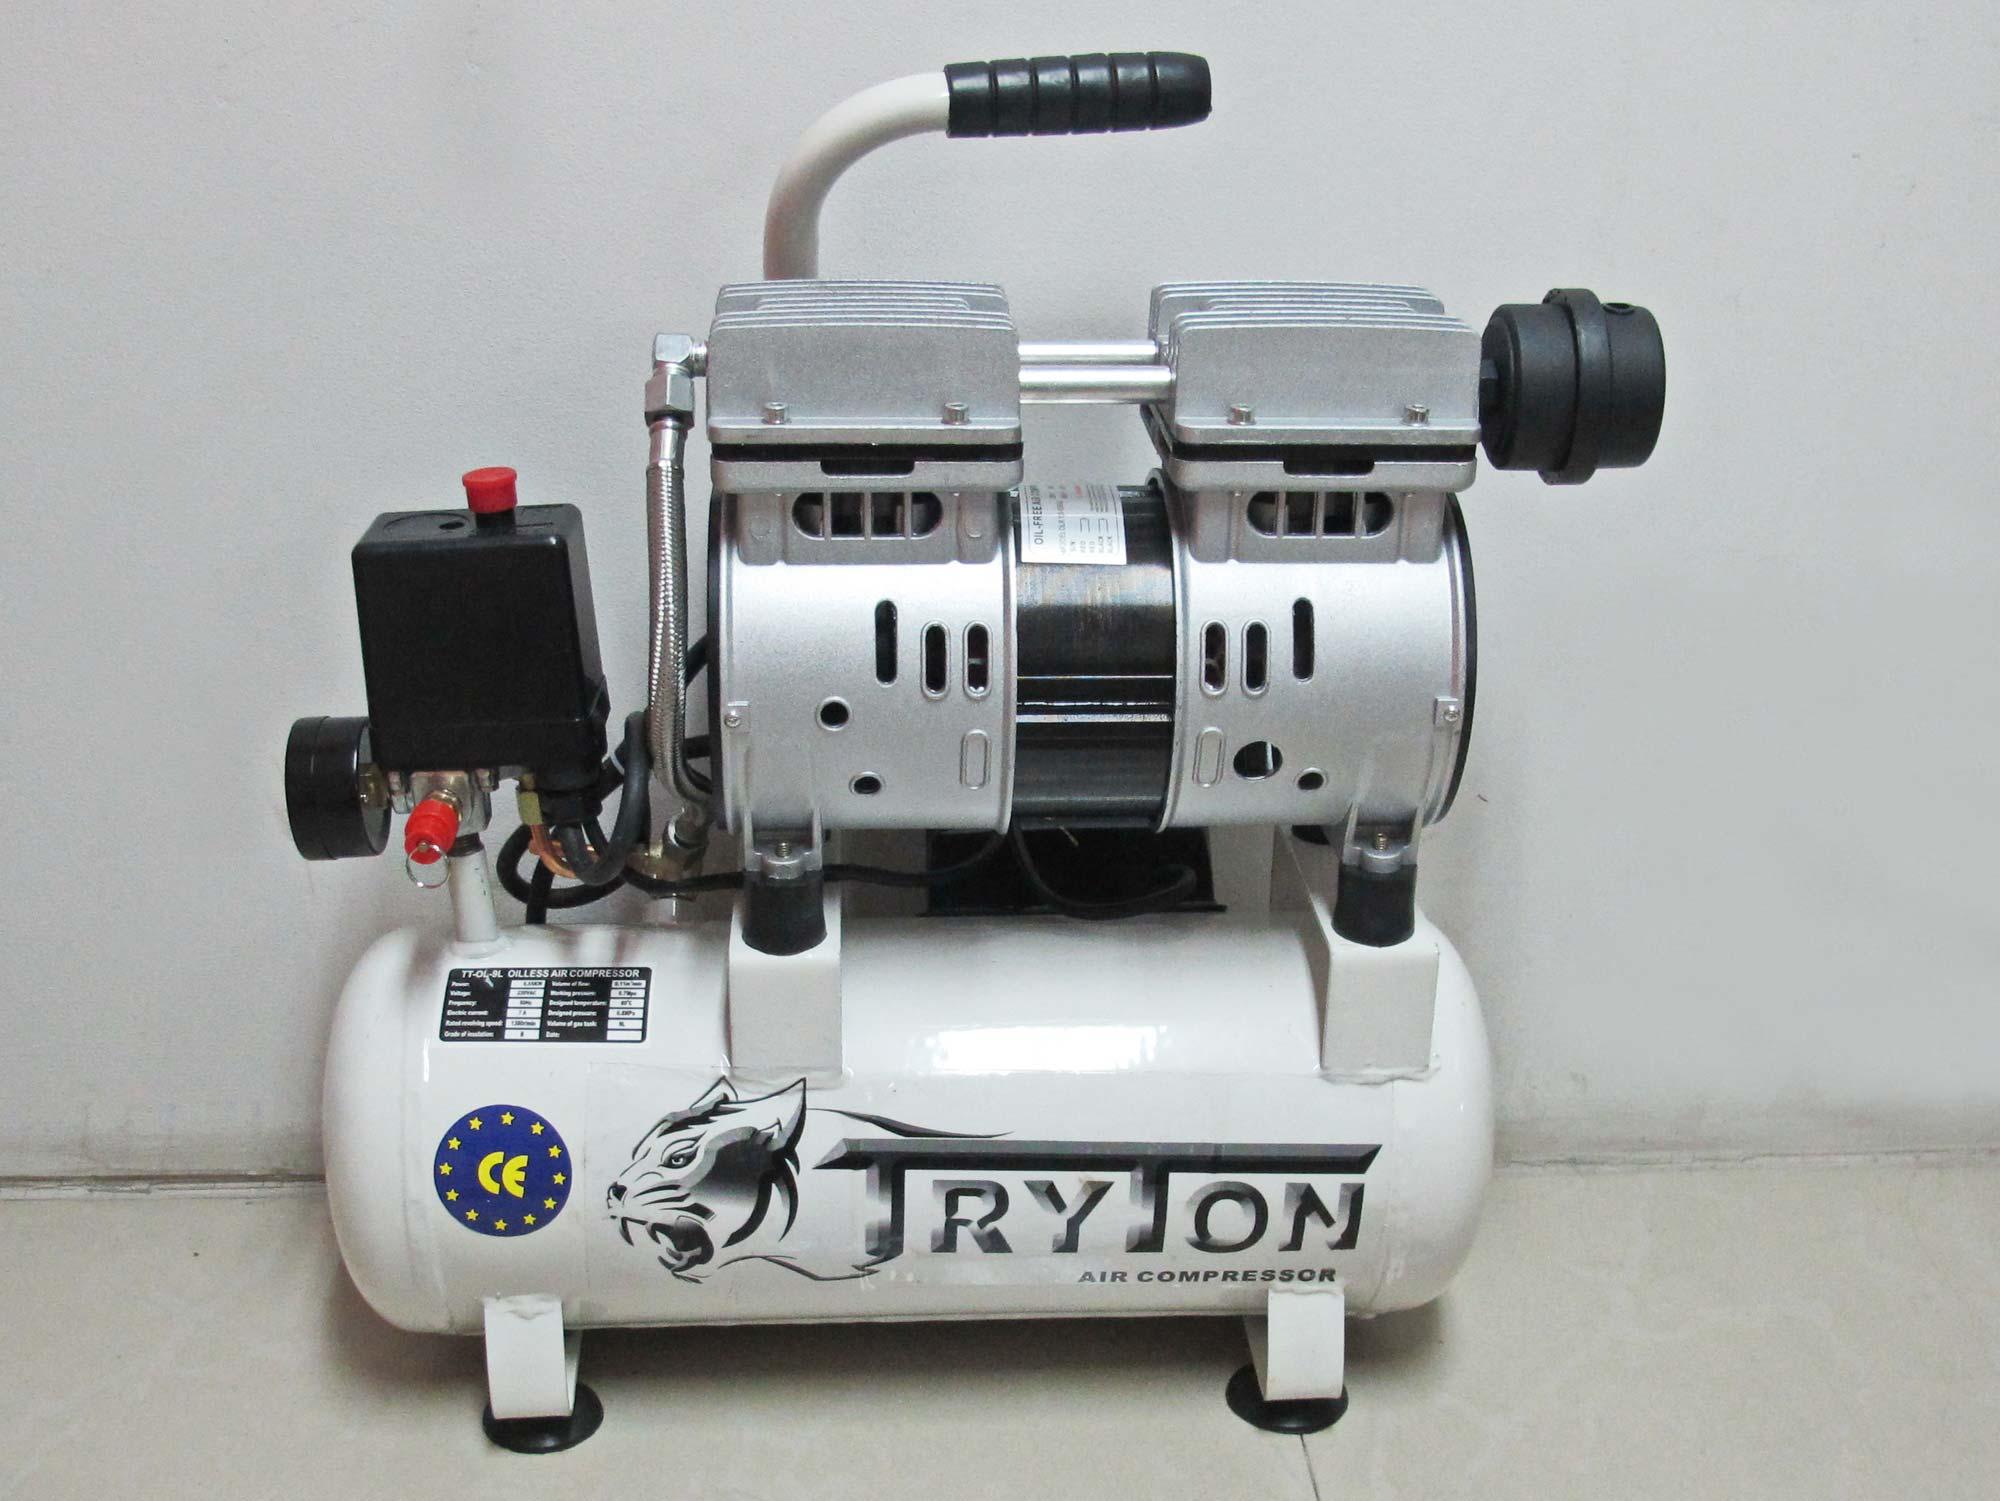 TRYTON ปั๊มลมเสียงเงียบ Oil Free 9ลิตร